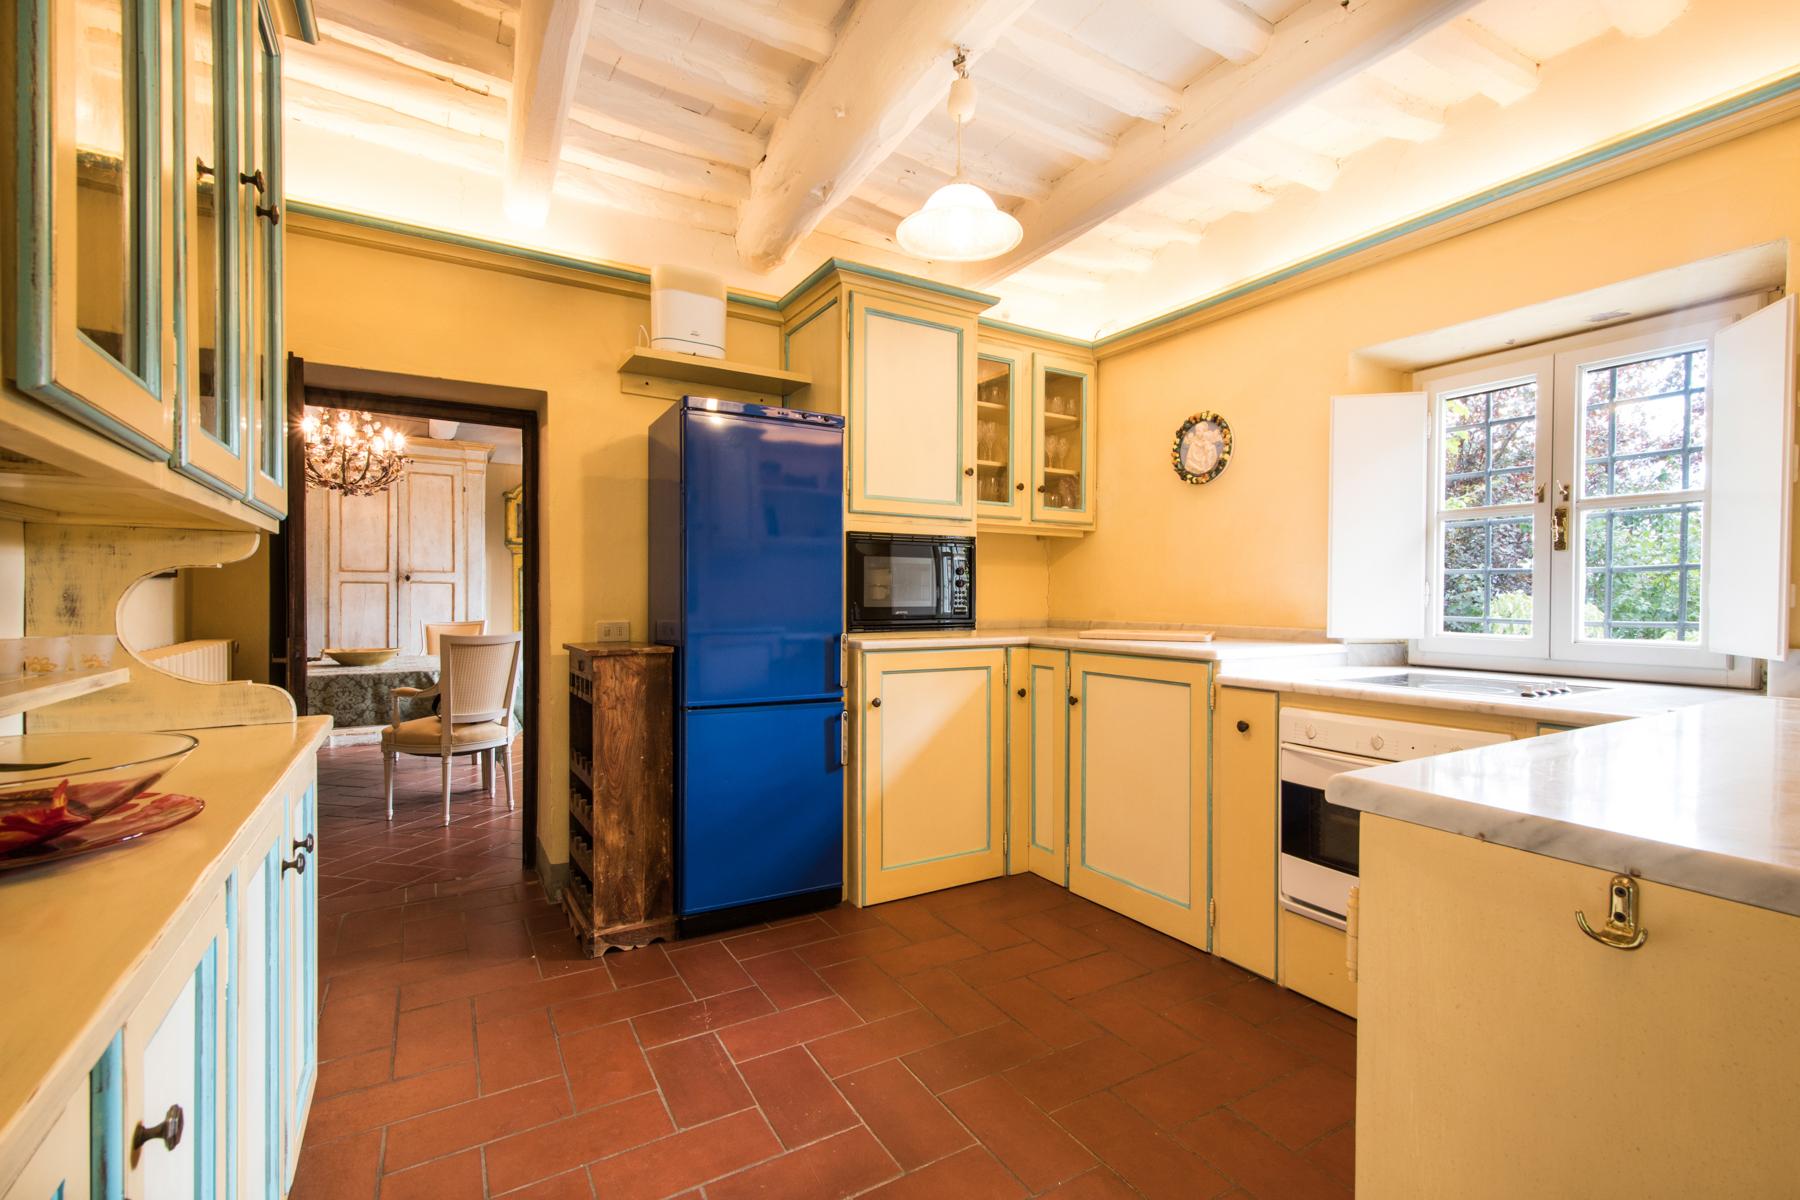 Villa in Vendita a Lucca: 5 locali, 1065 mq - Foto 30